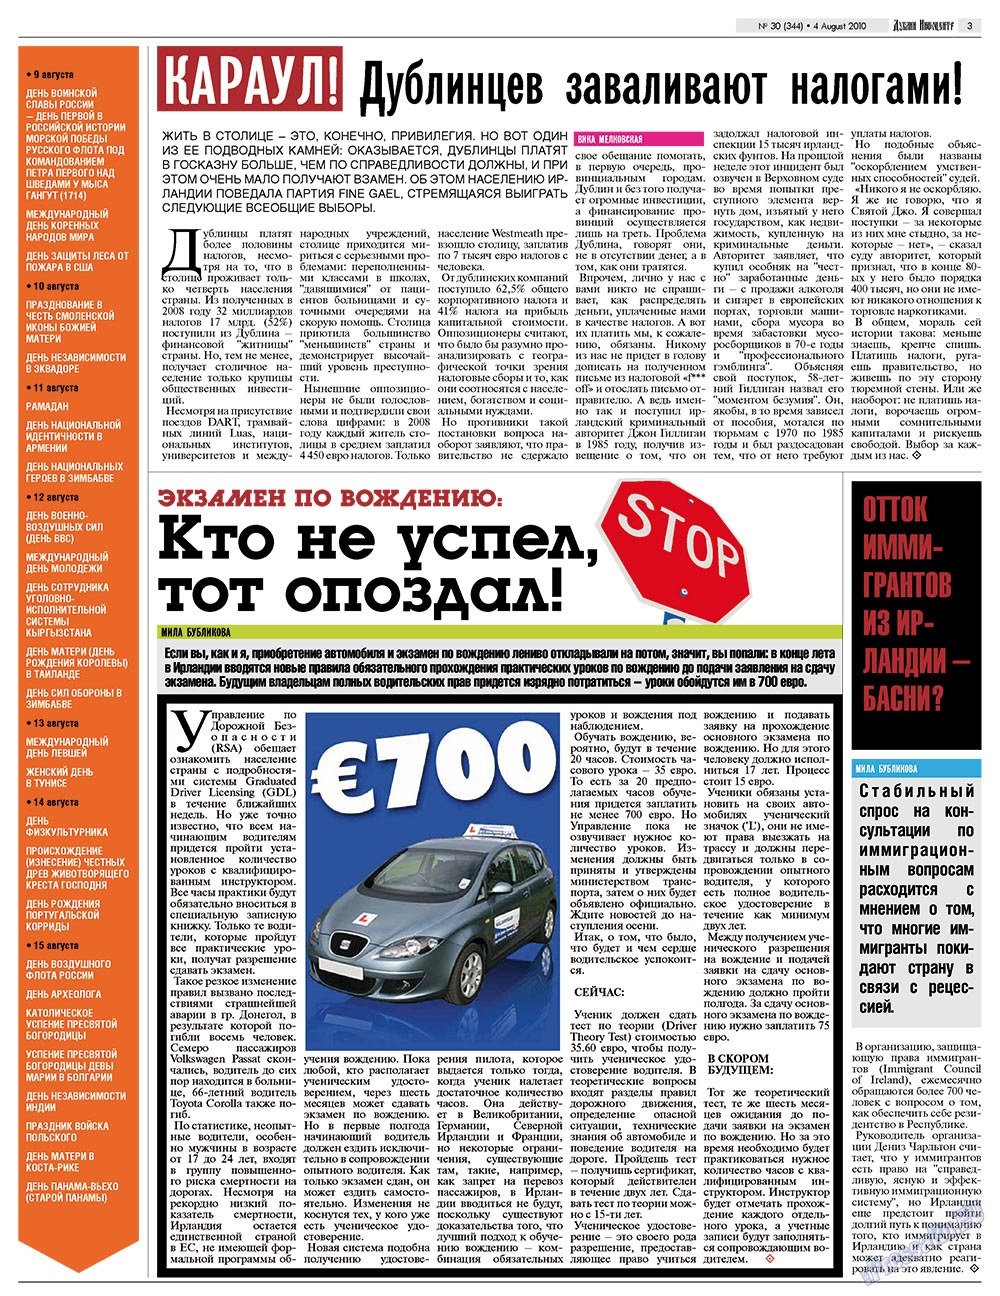 Дублин инфоцентр (газета). 2010 год, номер 30, стр. 3